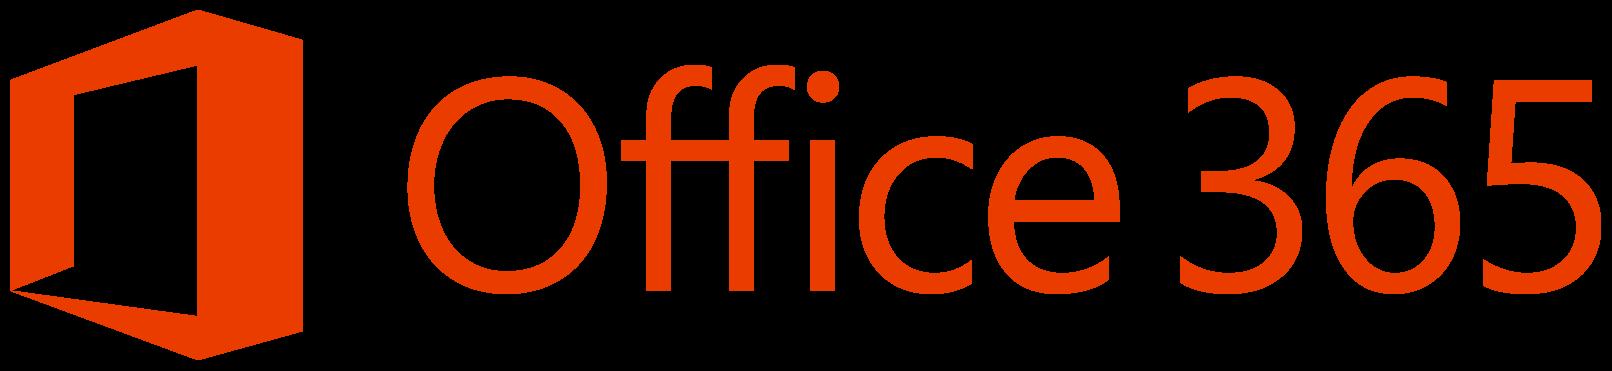 File:Office 365 logo.png.